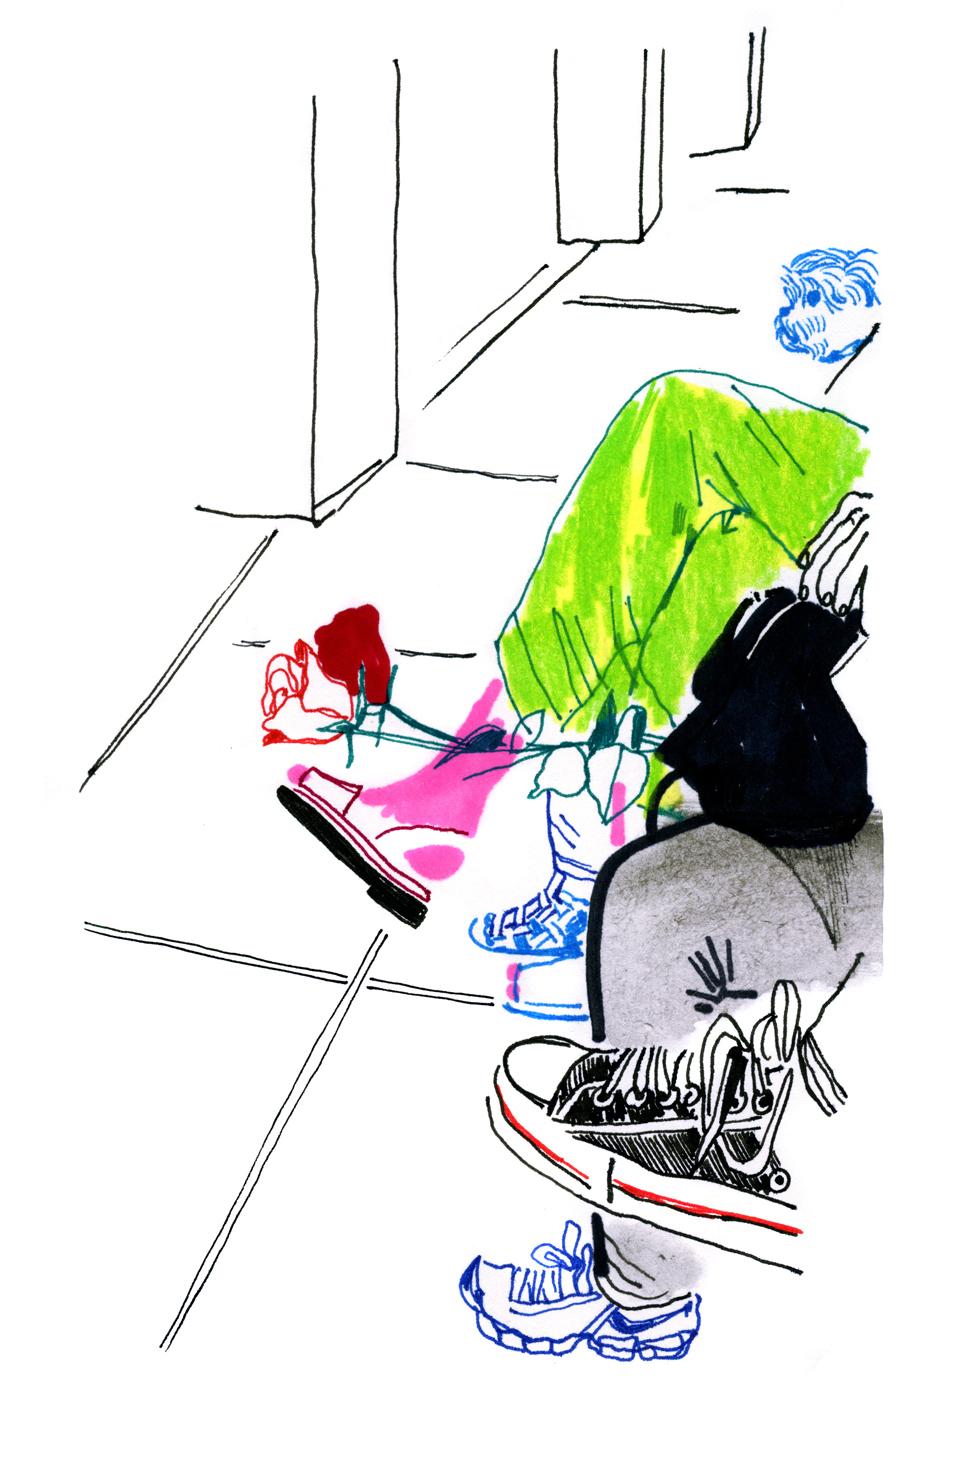 Sketchbook  Check out the sketchbook tumblr!